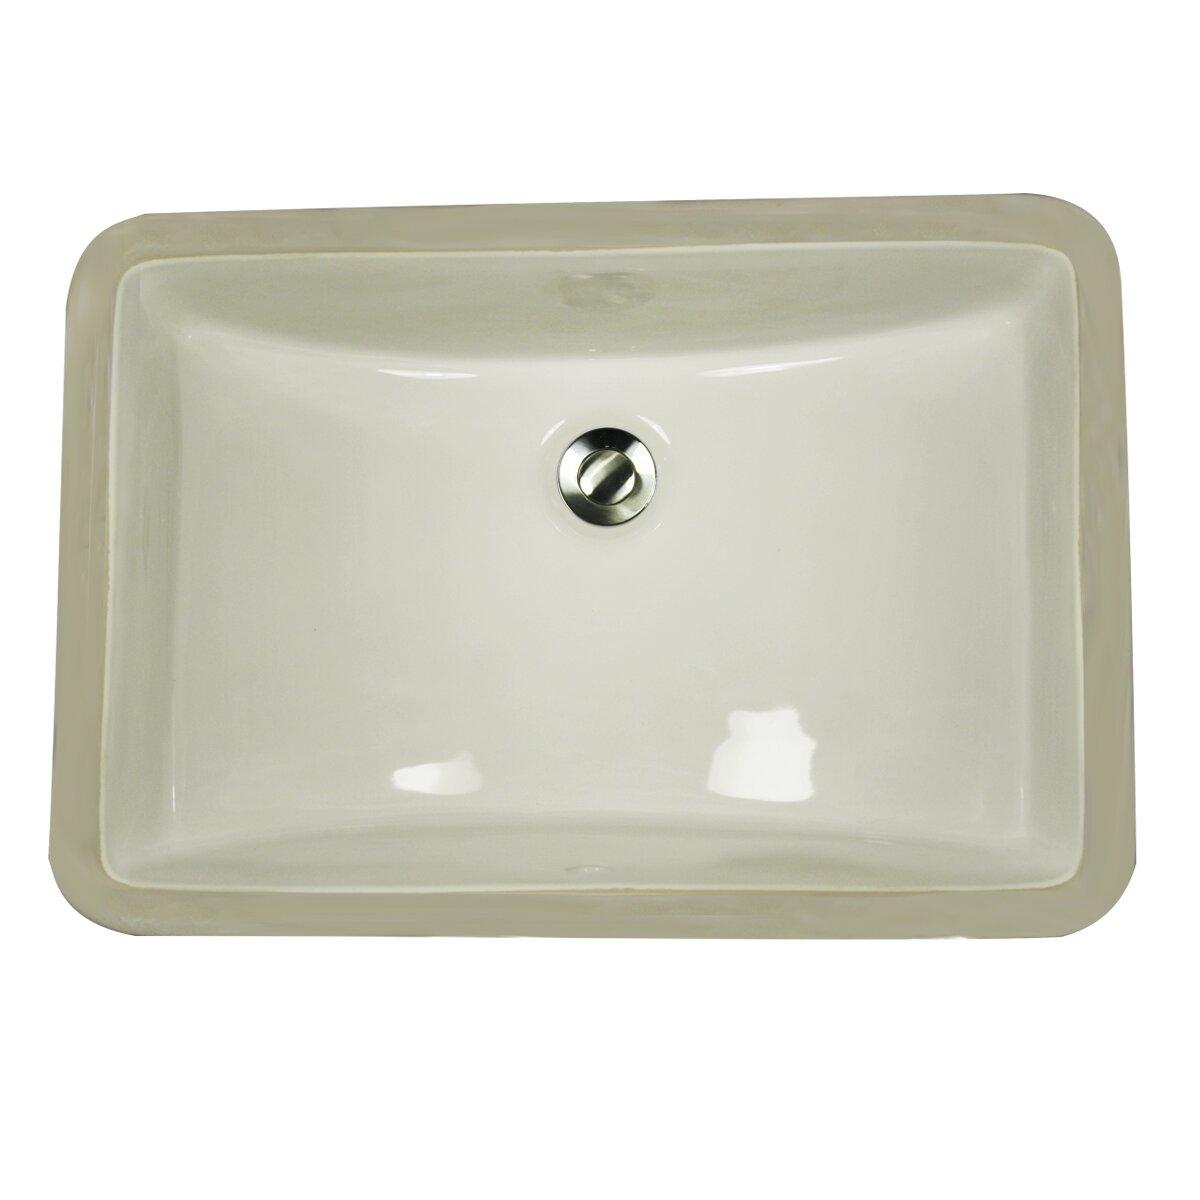 Nantucket Sinks Vitreous China Rectangular Undercounter Bathroom Sink